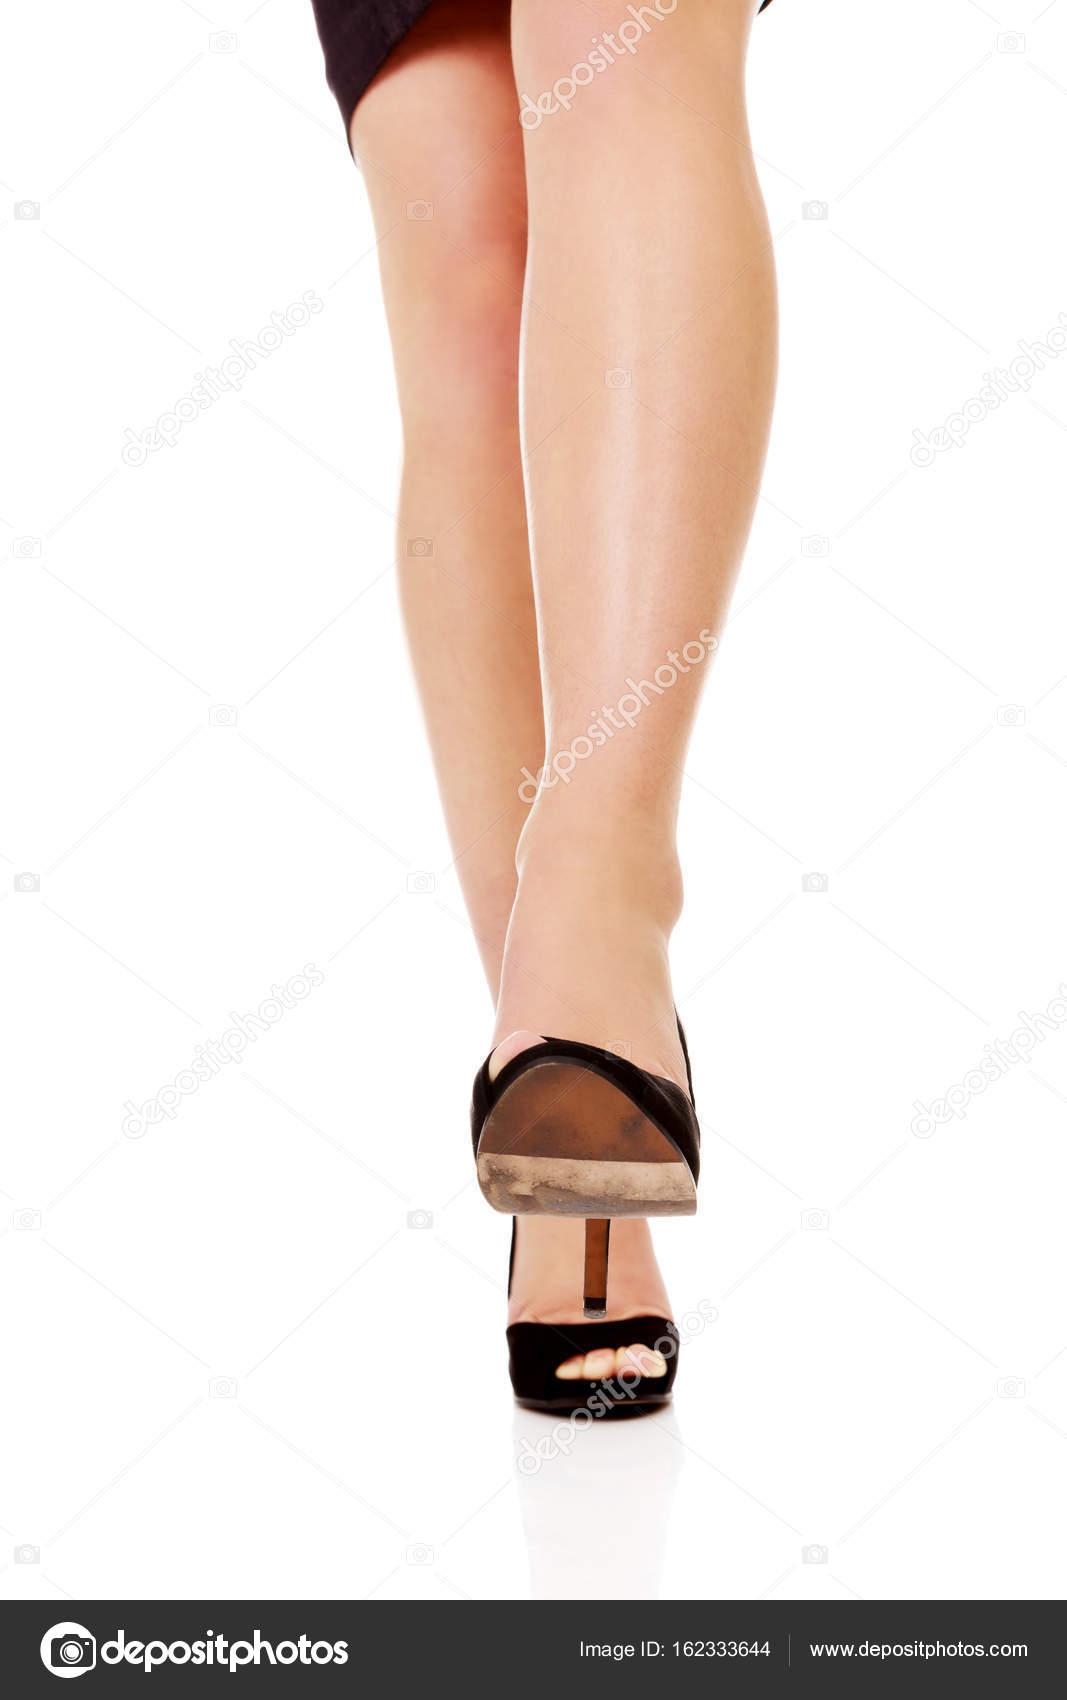 914dc2edec Γυναικείο πόδι σε ψηλά τακούνια που προσπαθεί να ποδοπατήσουν κάτι– εικόνα  αρχείου